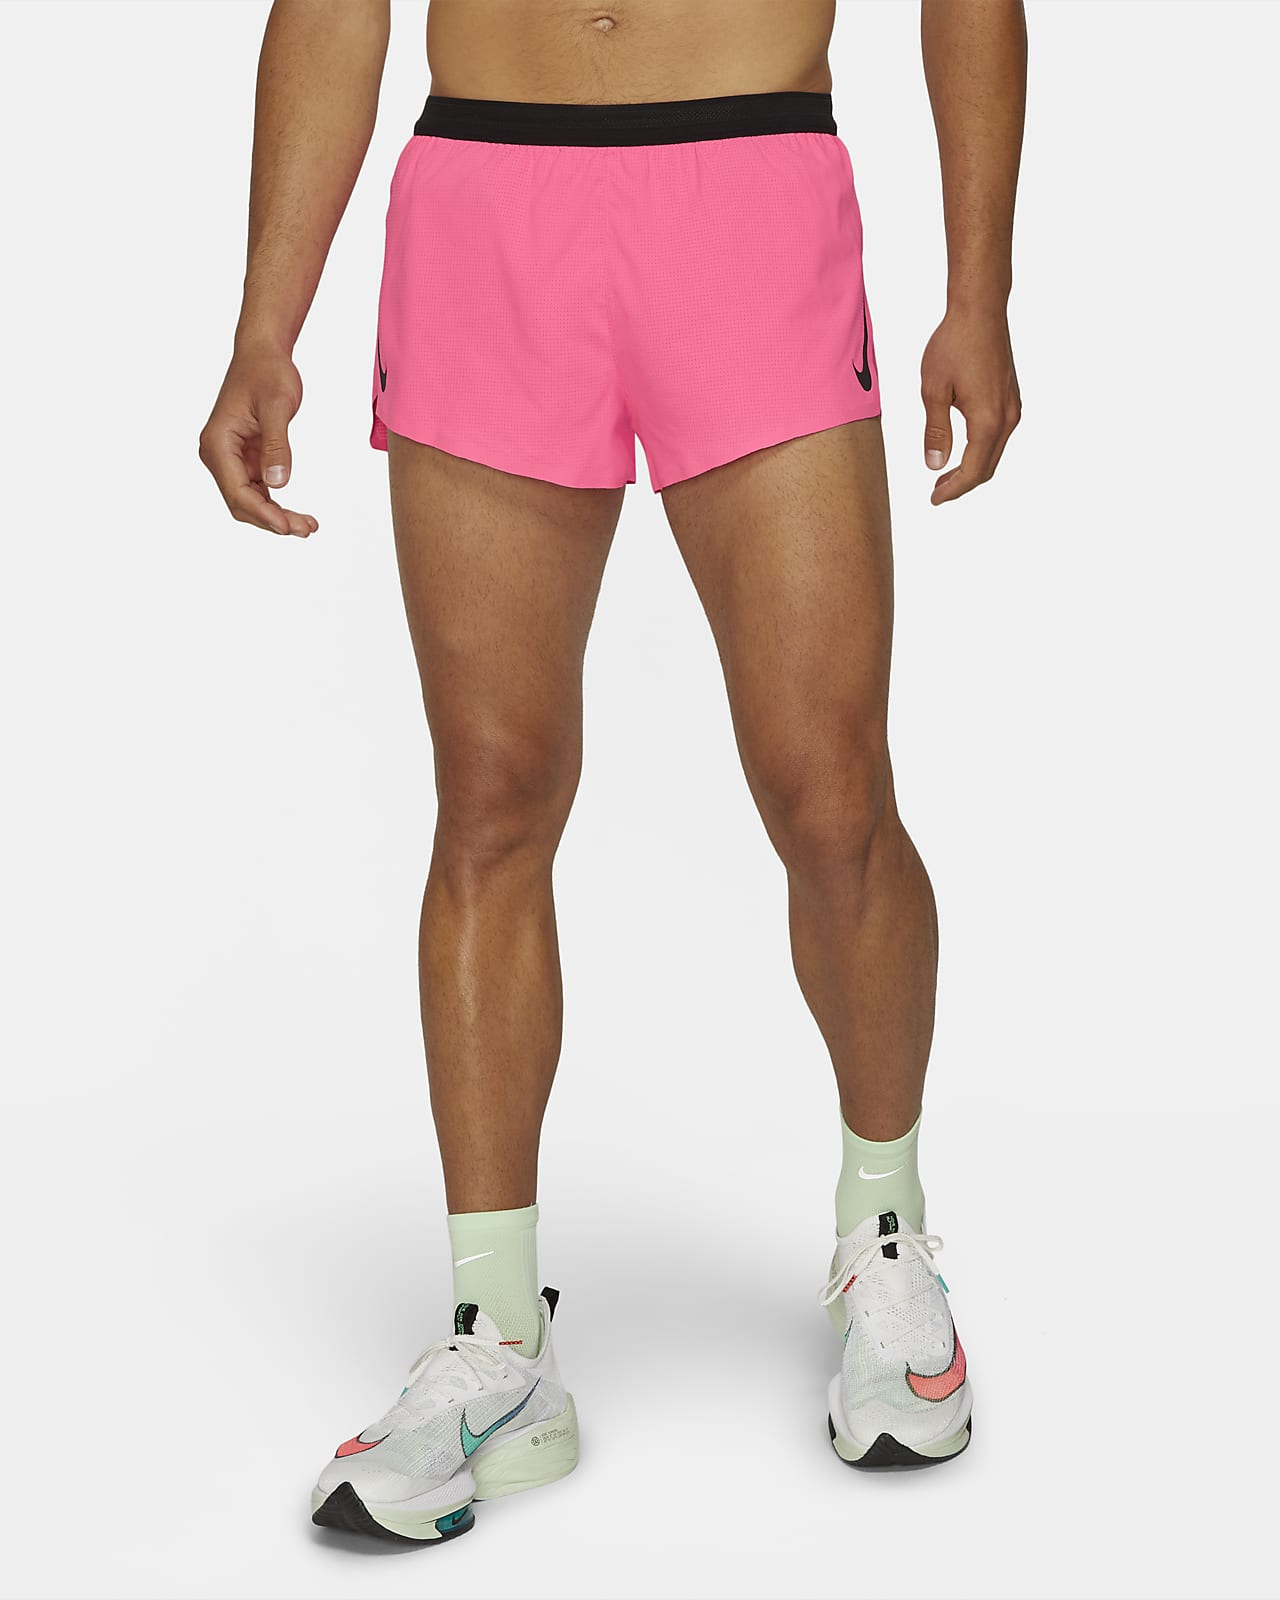 Short de running Nike AeroSwift 5 cm pour Homme